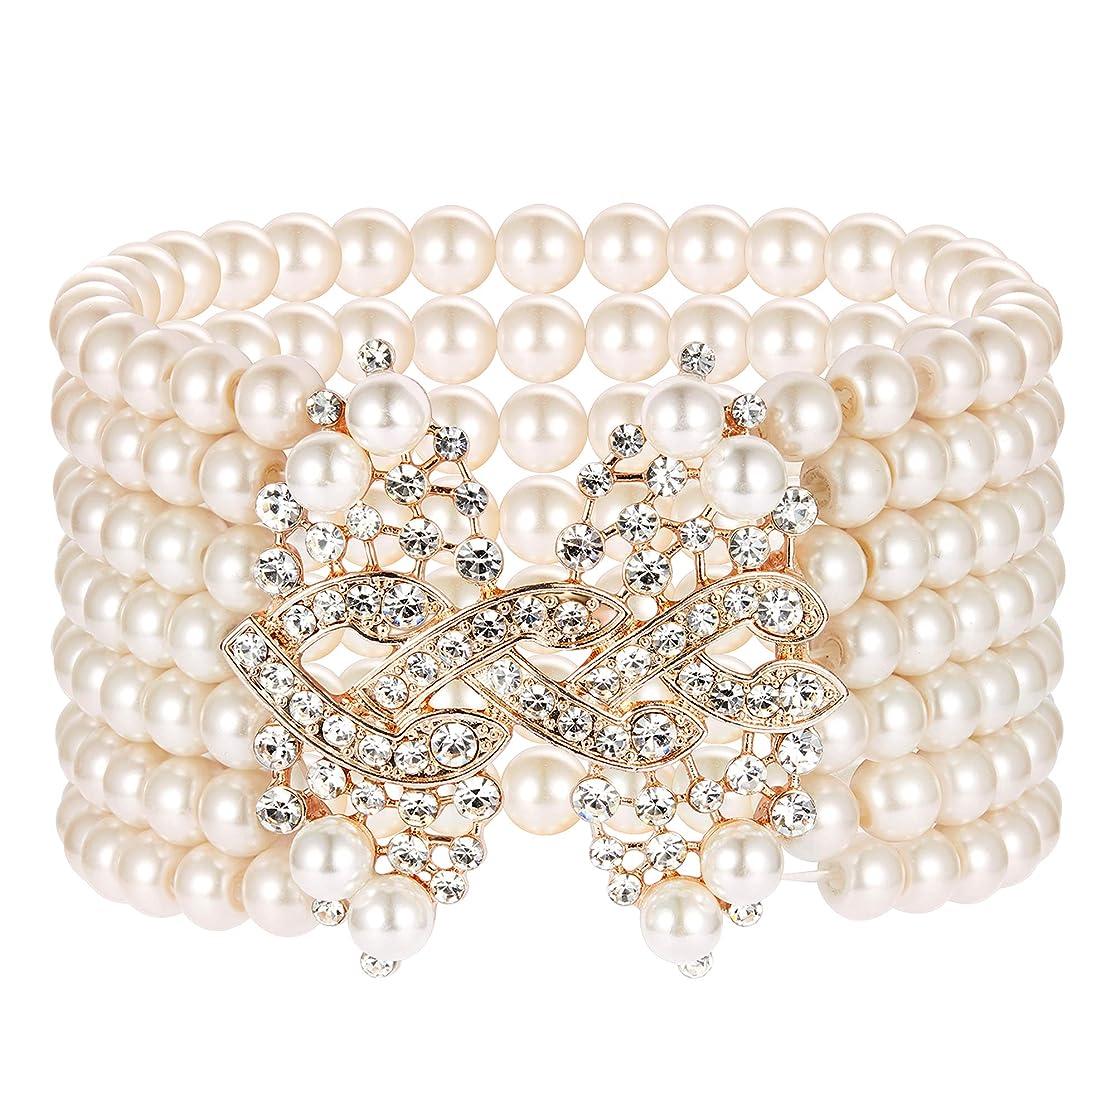 BABEYOND 1920s Art Deco Bracelet Flapper Pearl Bracelet Great Gatsby Elastic Imitation Pearl Bracelet Roaring 20s Accessories Jewelry 7 Rows vzychvtw2